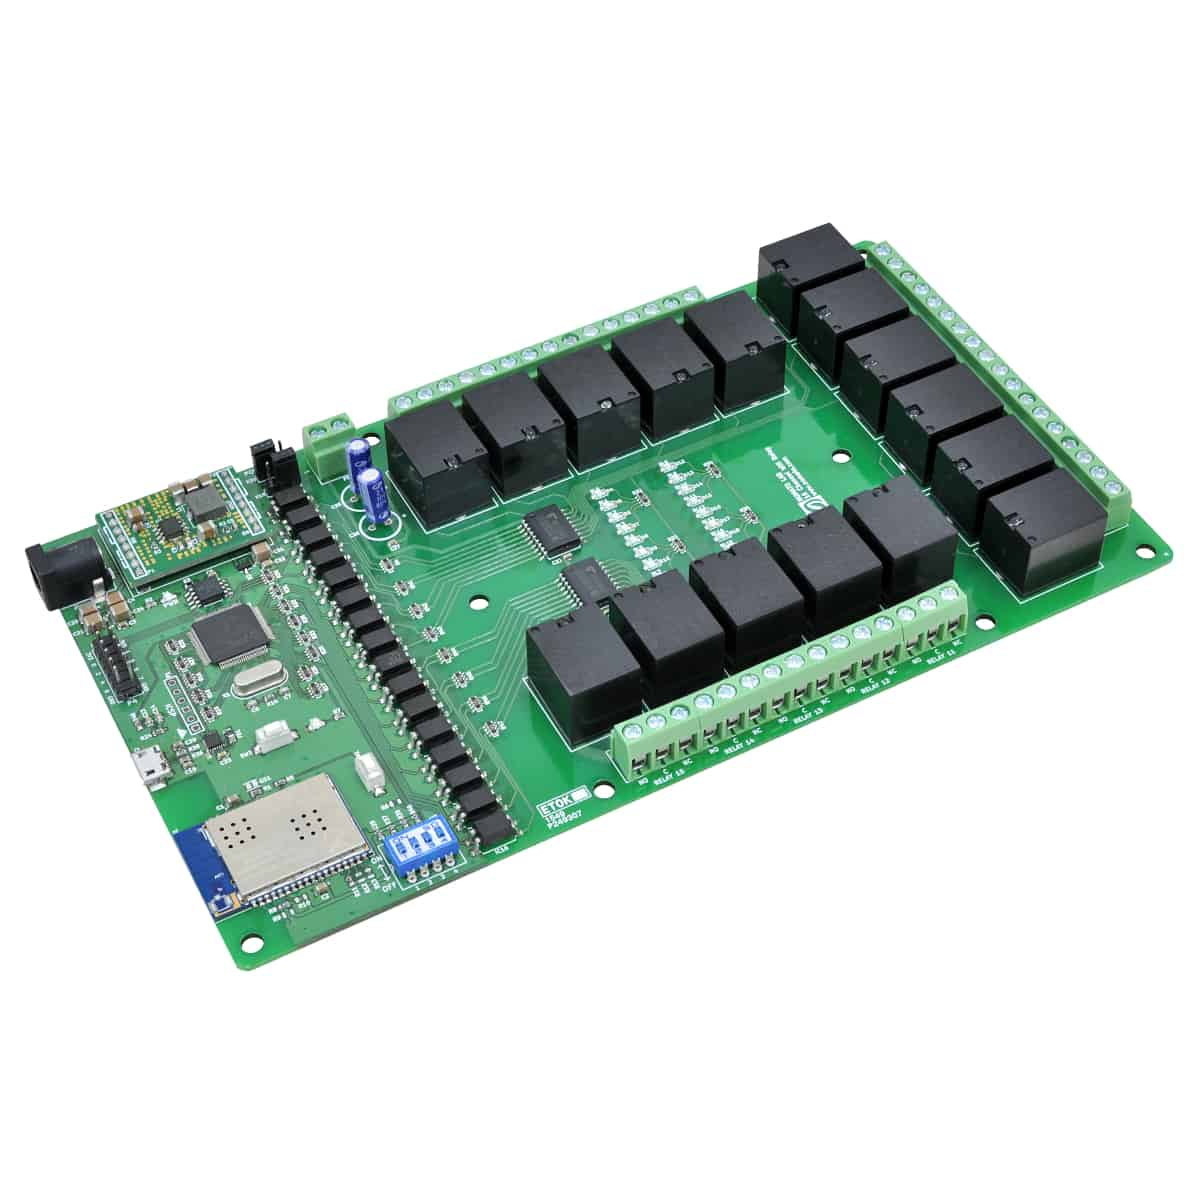 16 Channel Wifi Relay Module Numato Lab Help Center Wiring Diagram Spdt Dip Switch Configuration 16channelwifirelay 1